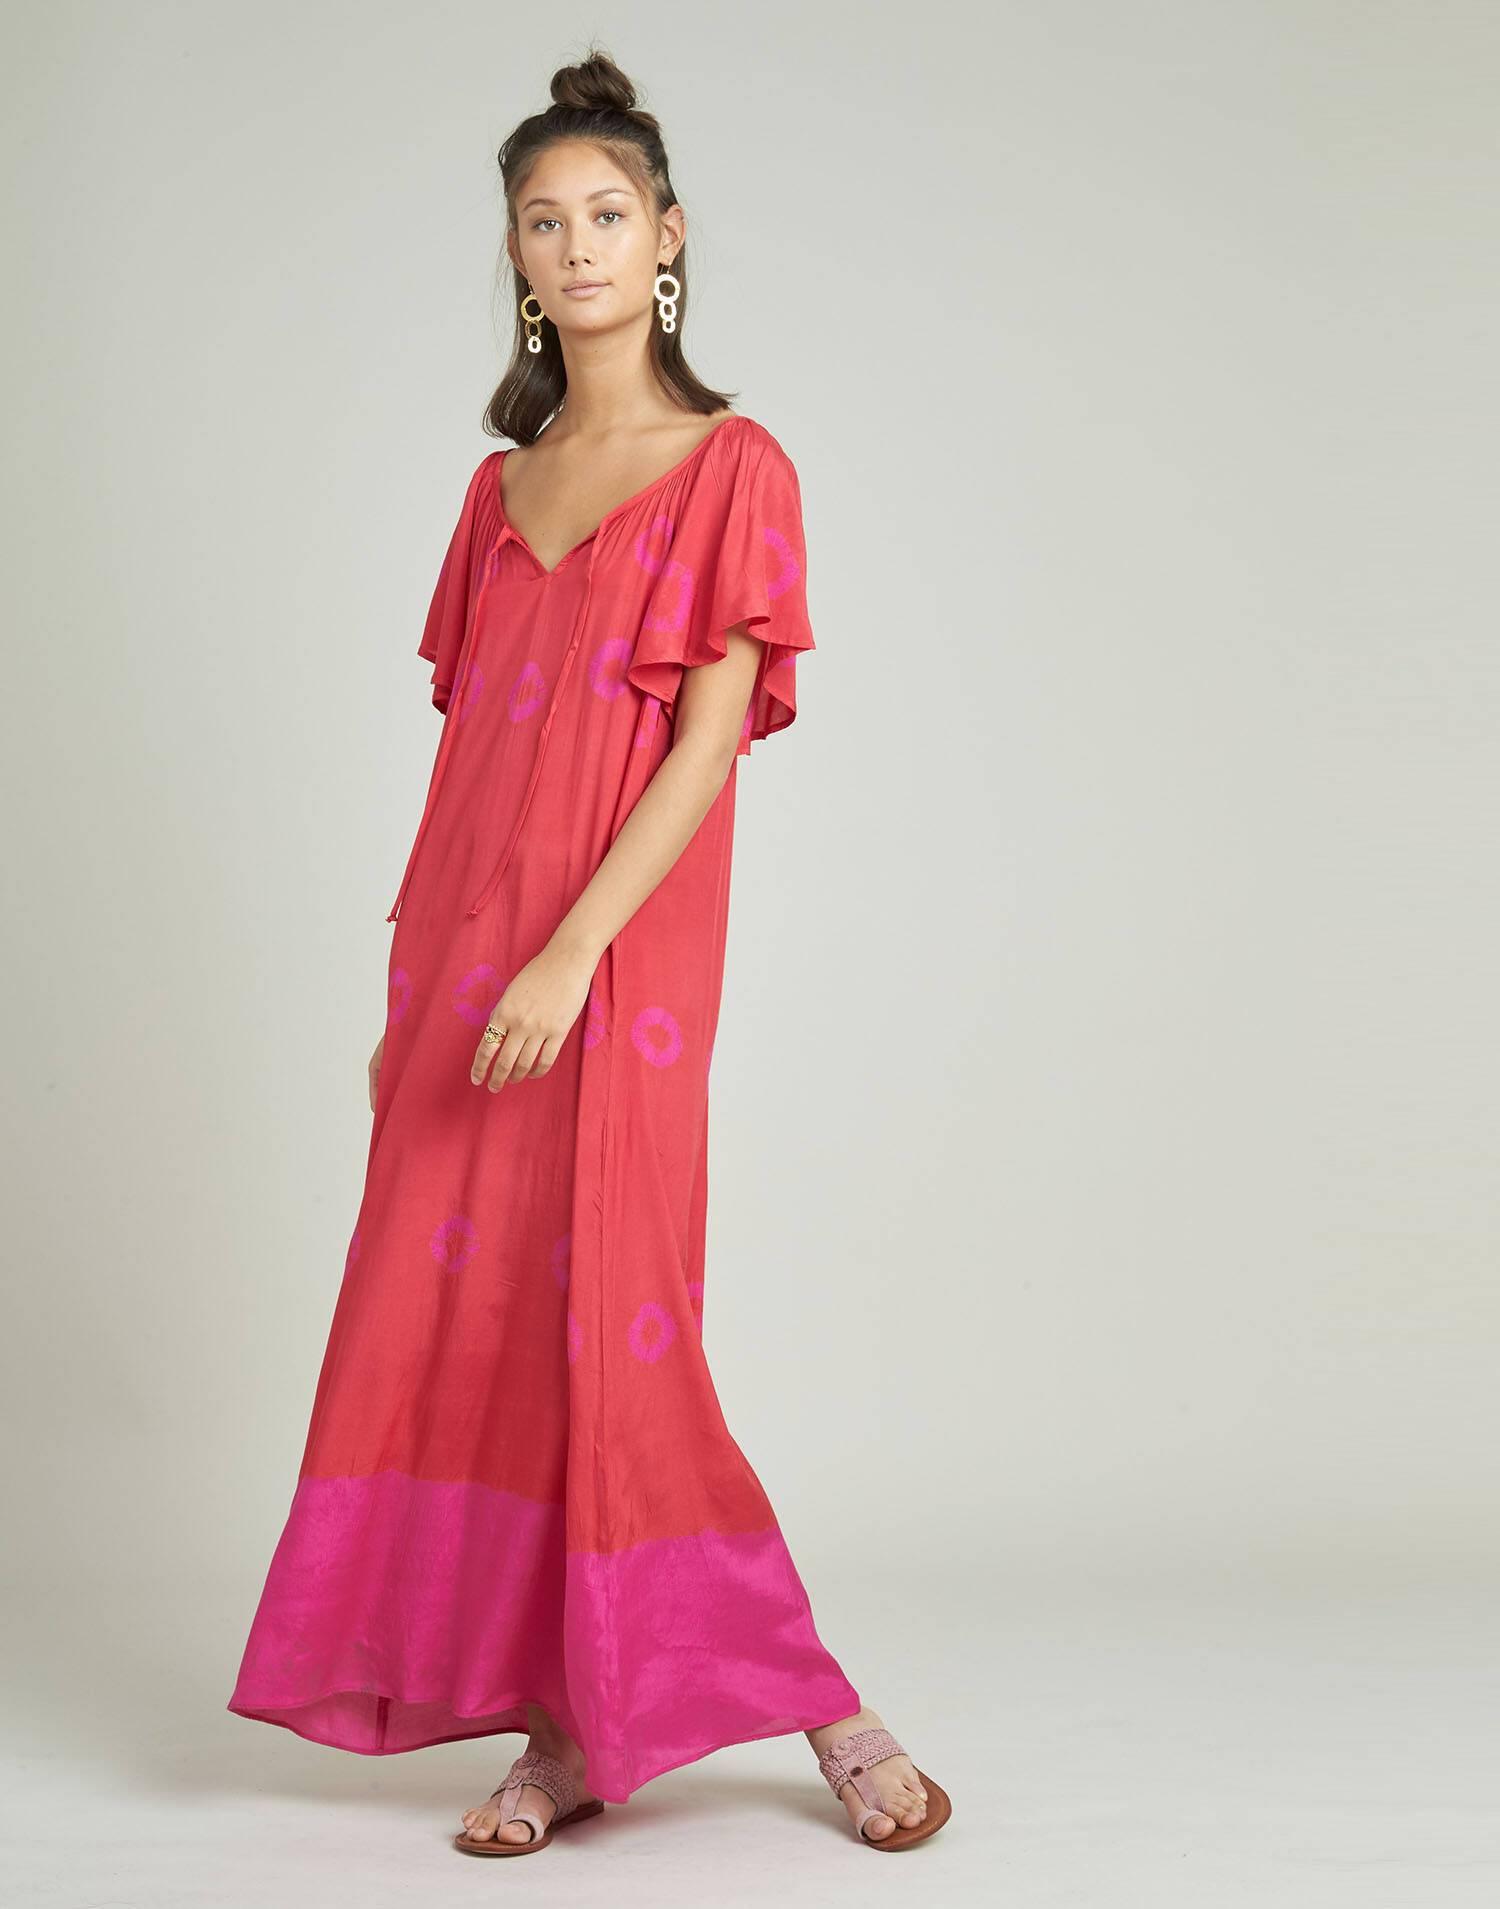 Vestido túnica bandhani degradado